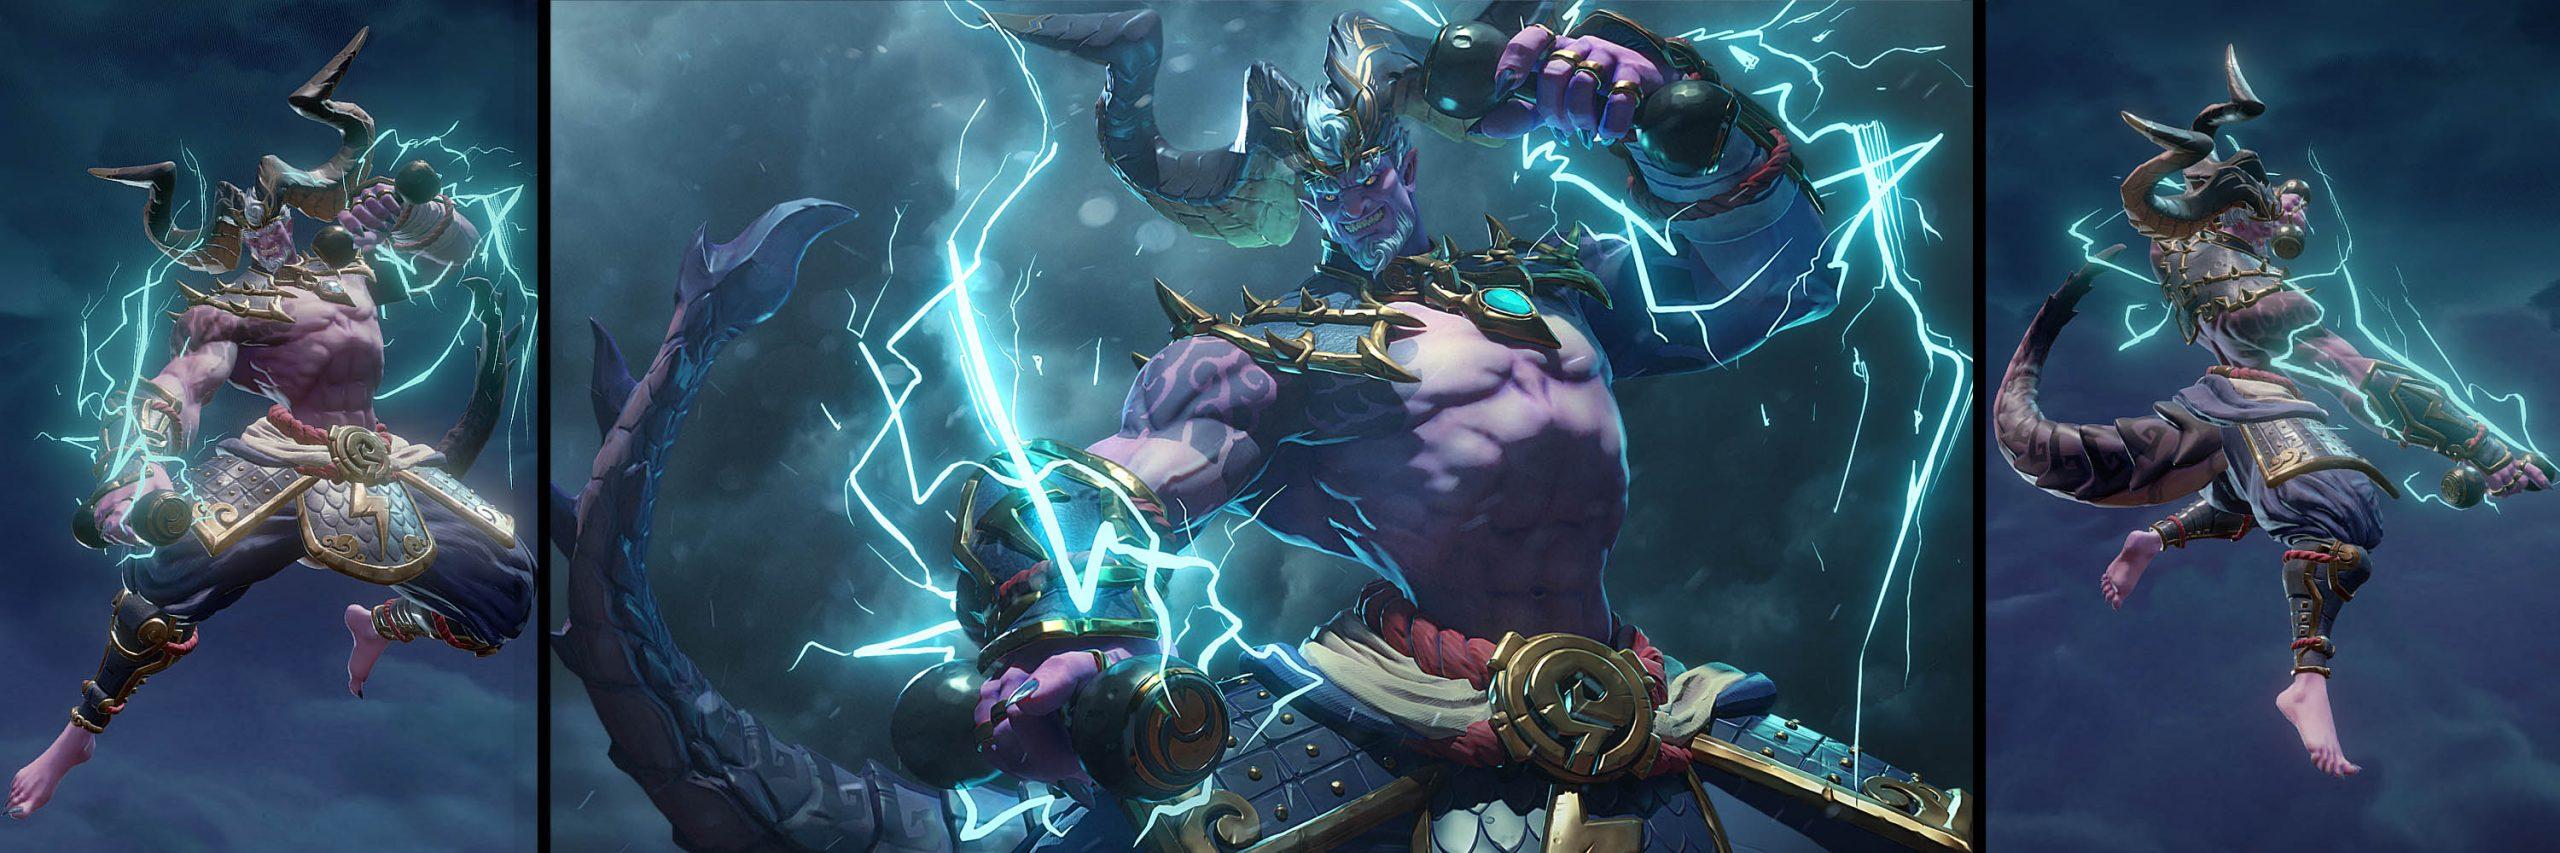 raijin the thunder caller header image